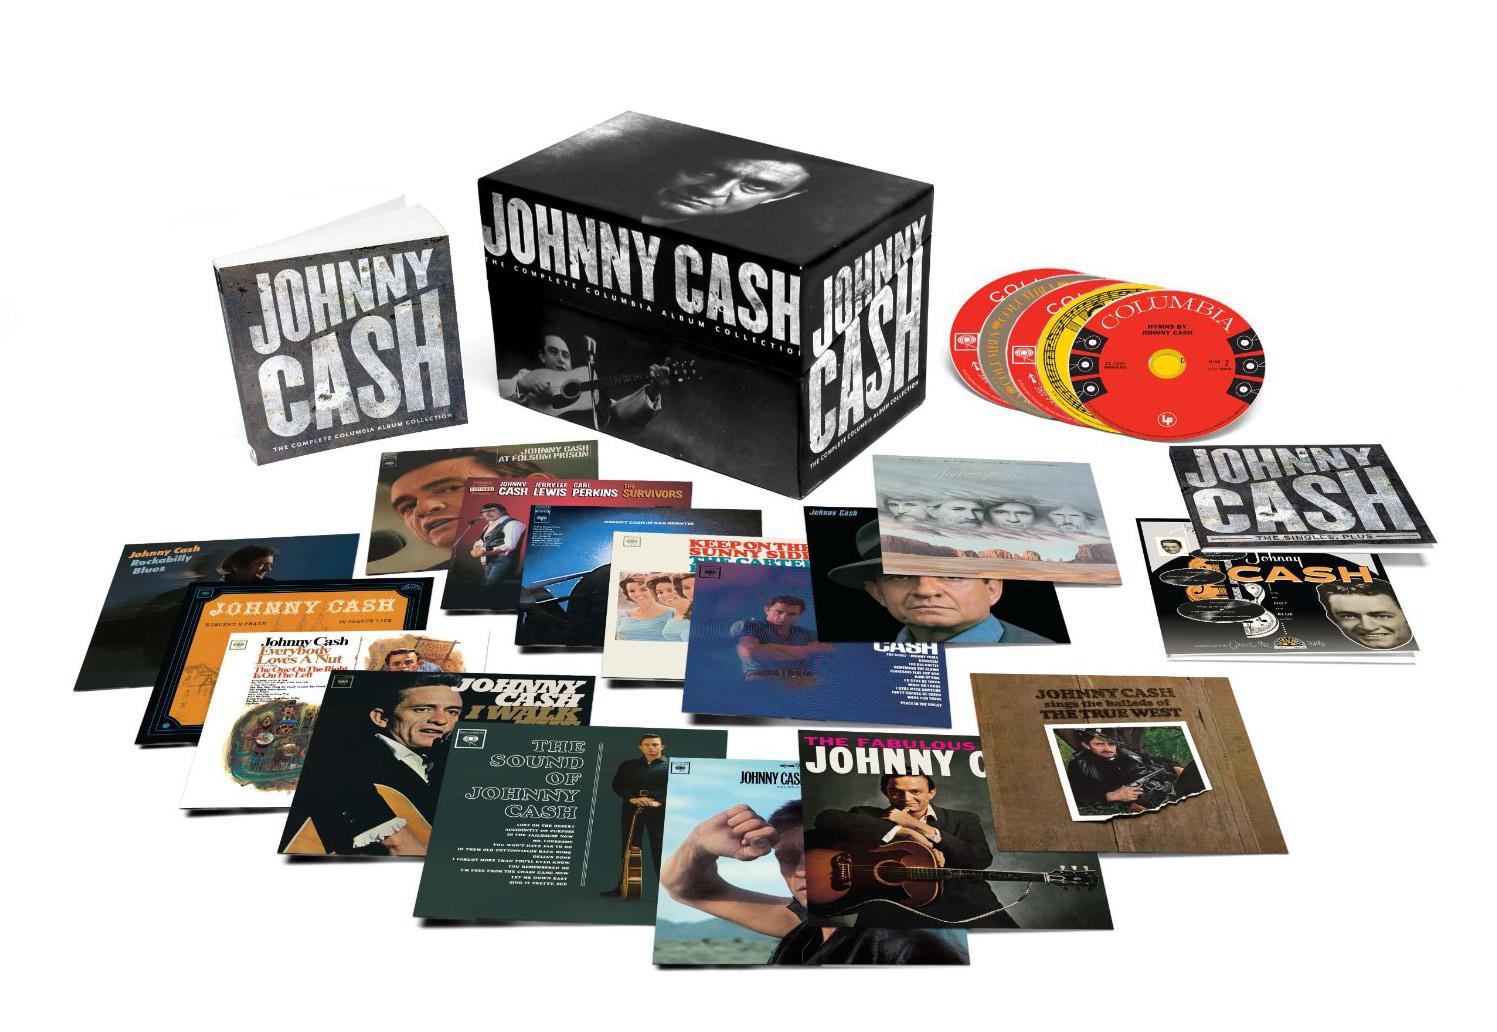 Johnny cash essay with an arguement?